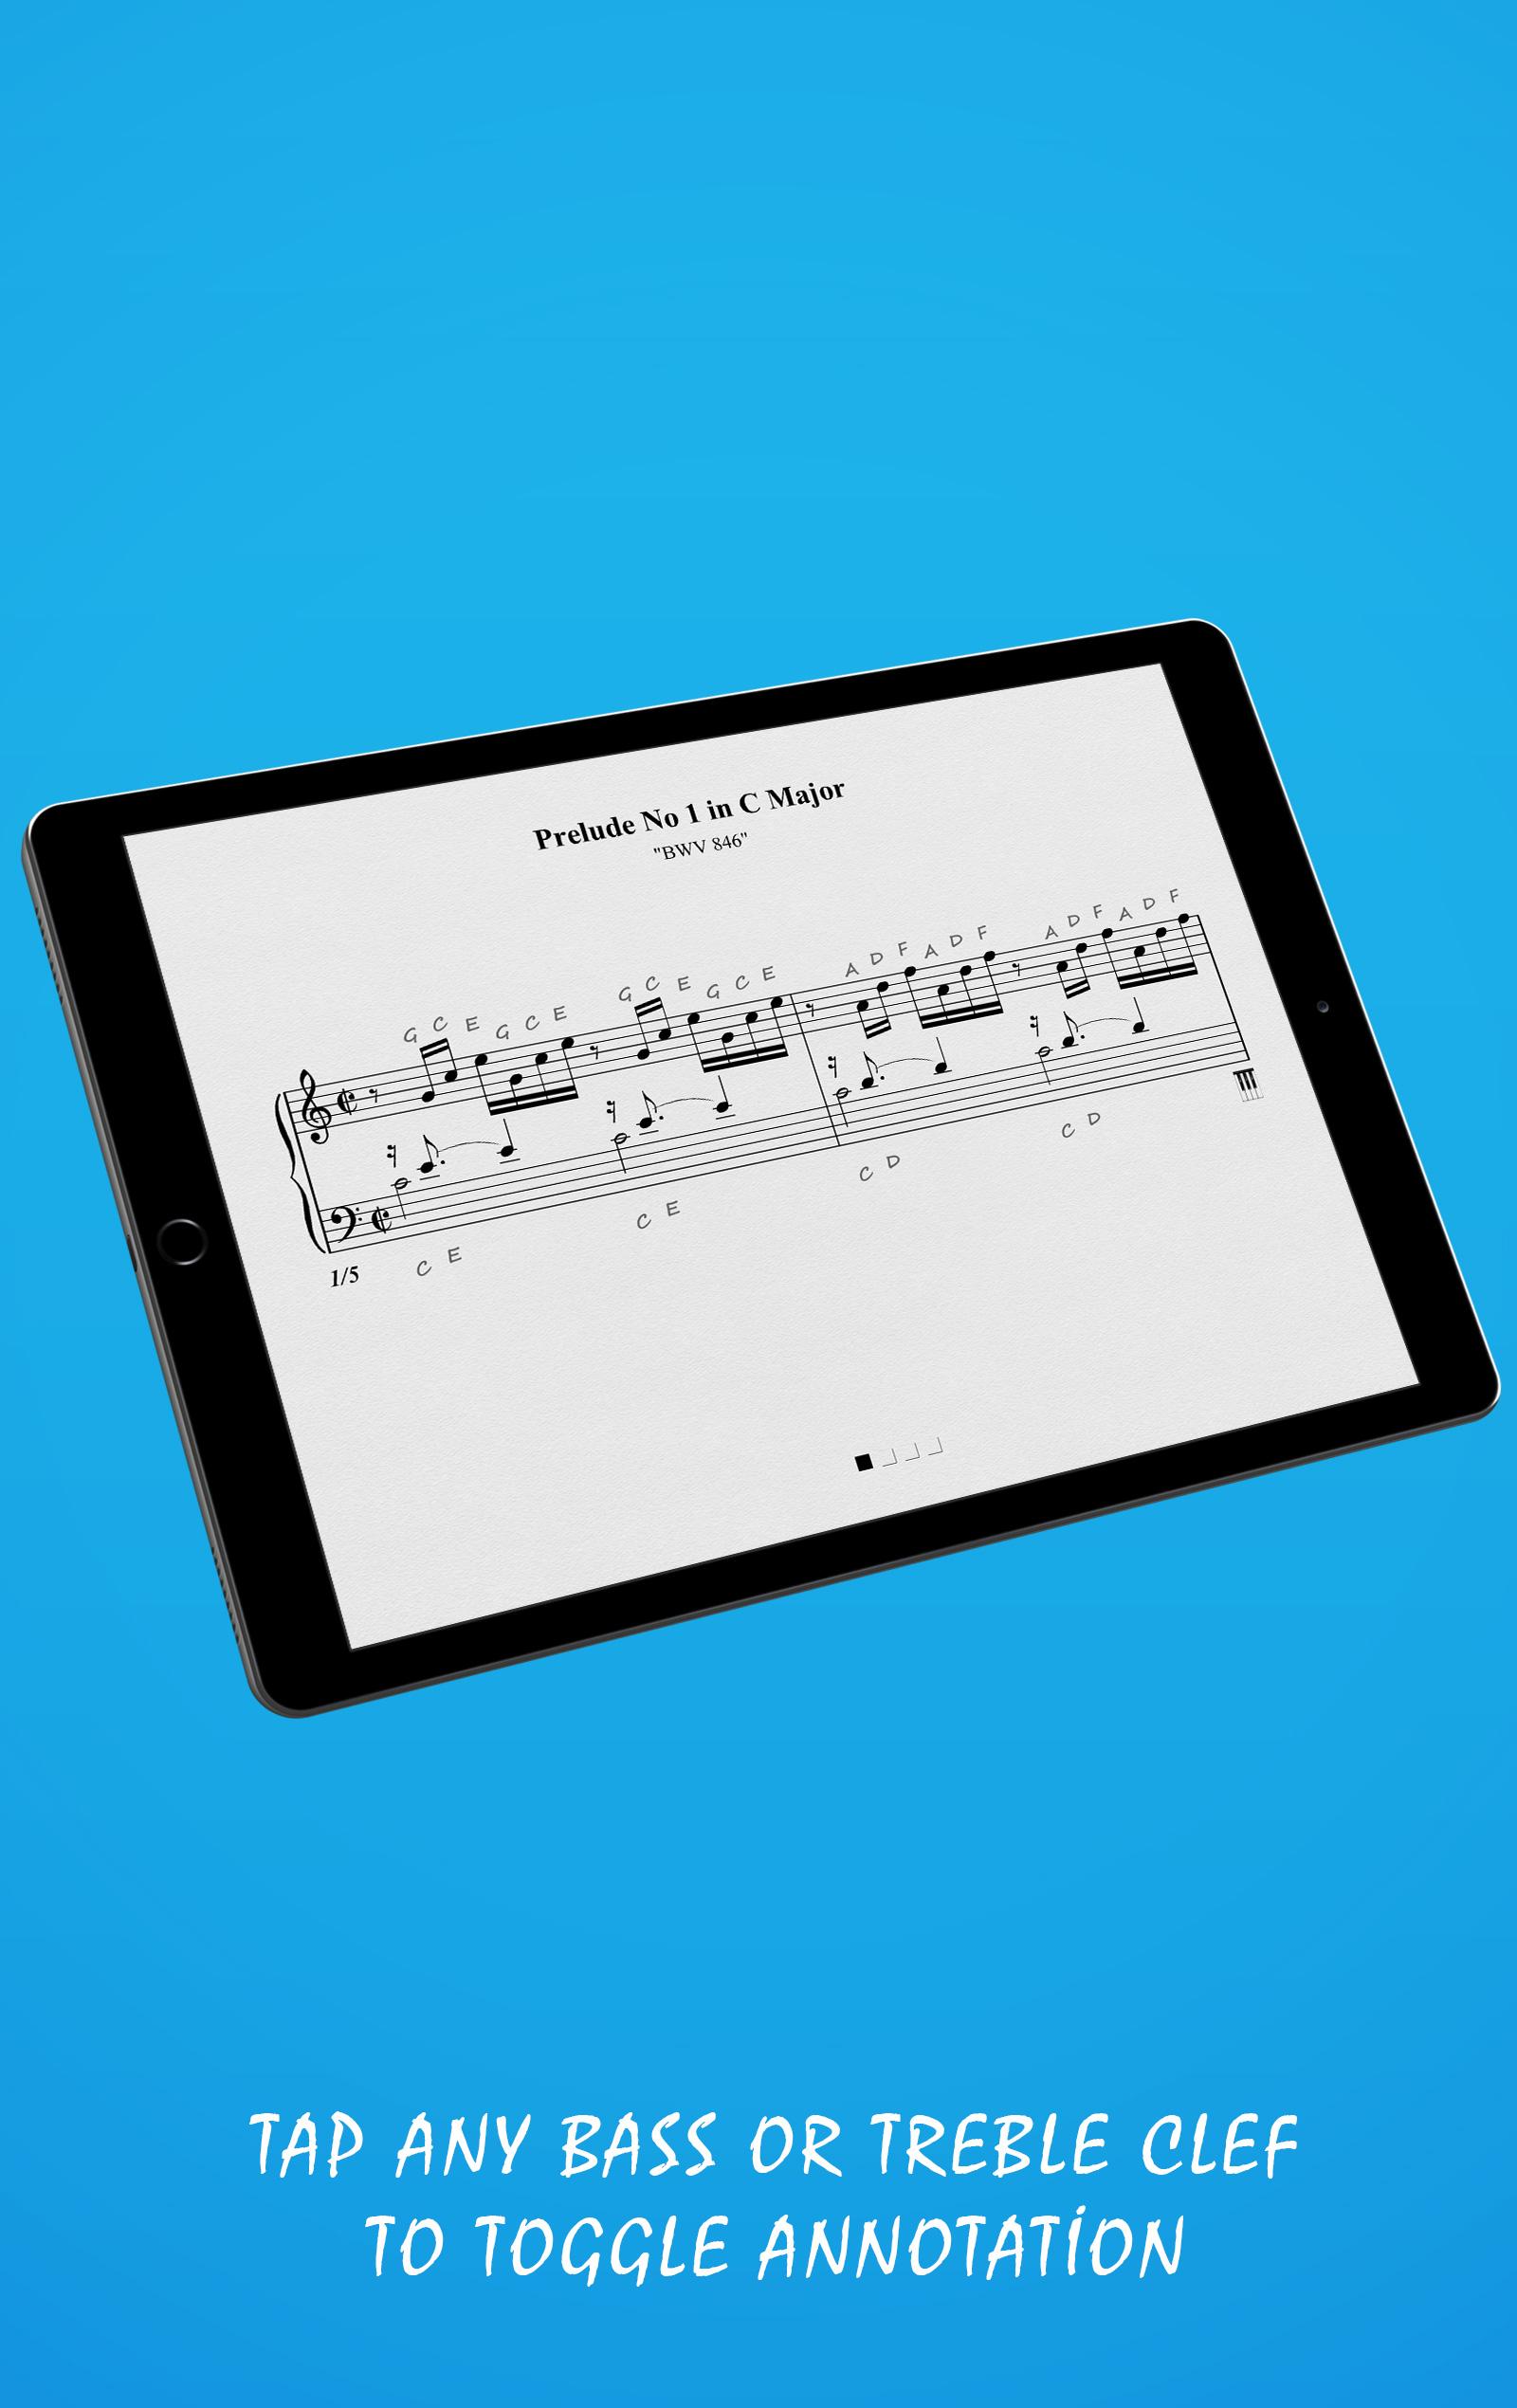 Prelude No 1 C Major (Features)